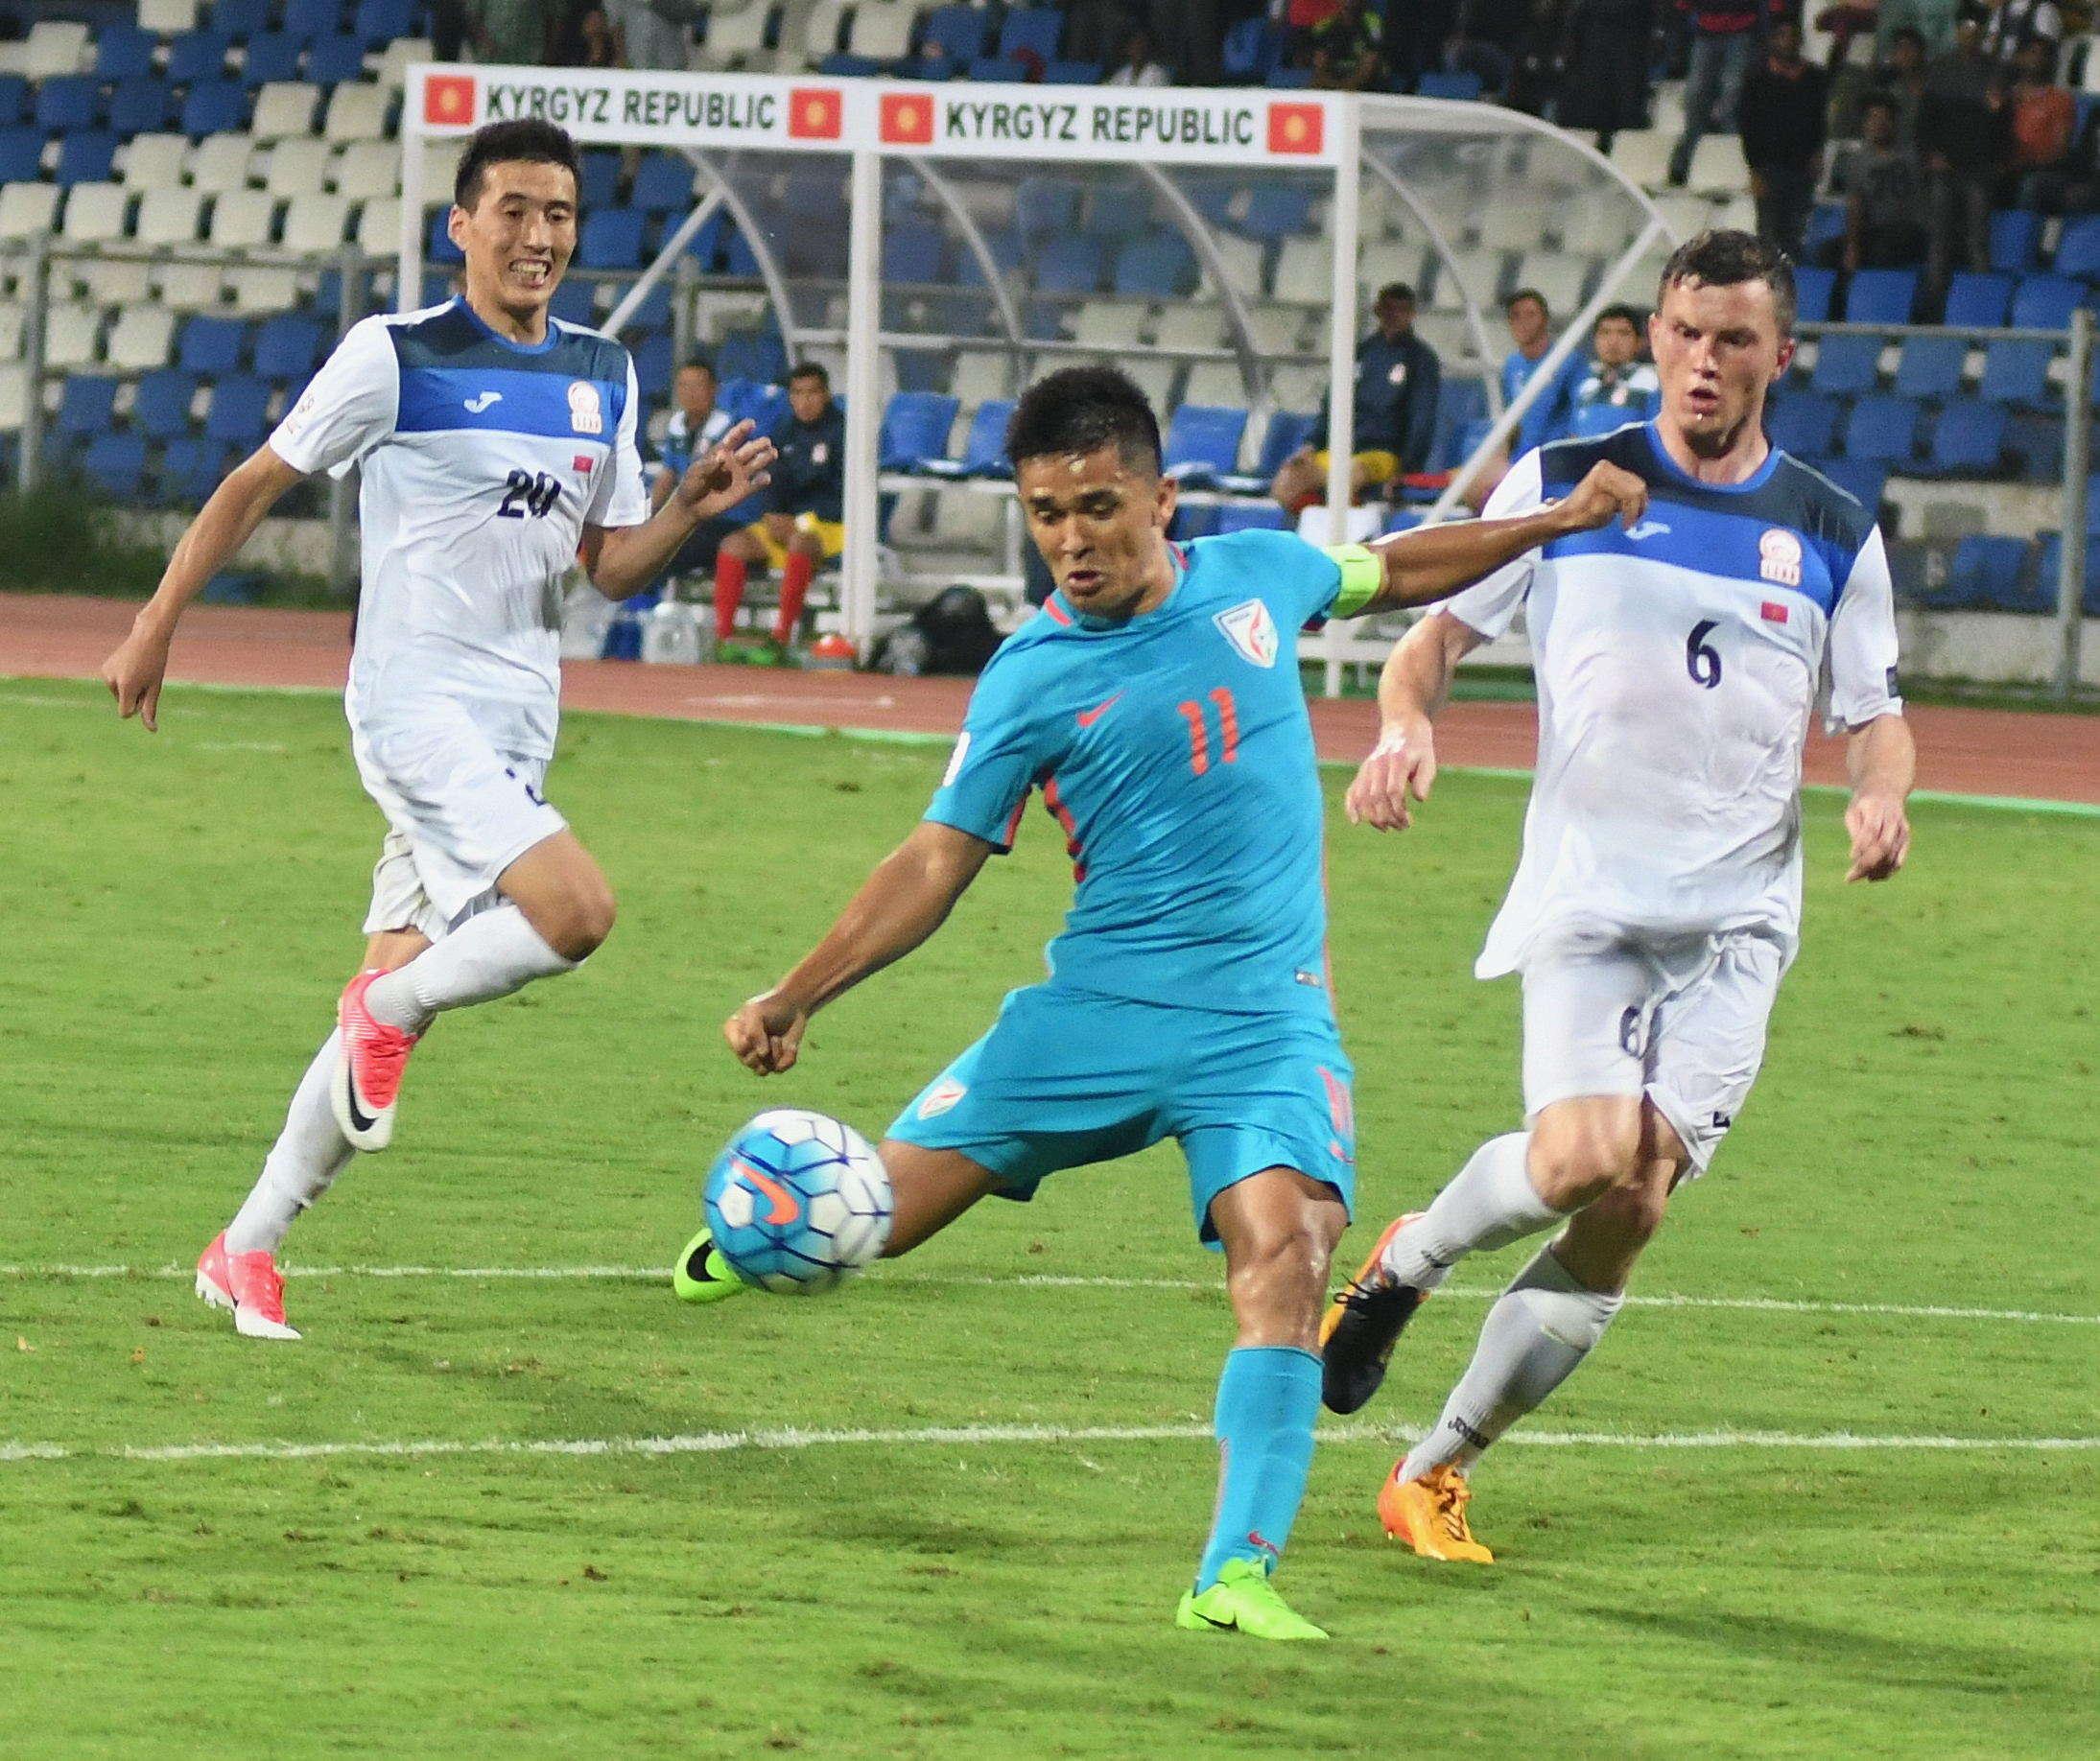 sunil-chhetri-indias-talisman-football-striker-turns-34